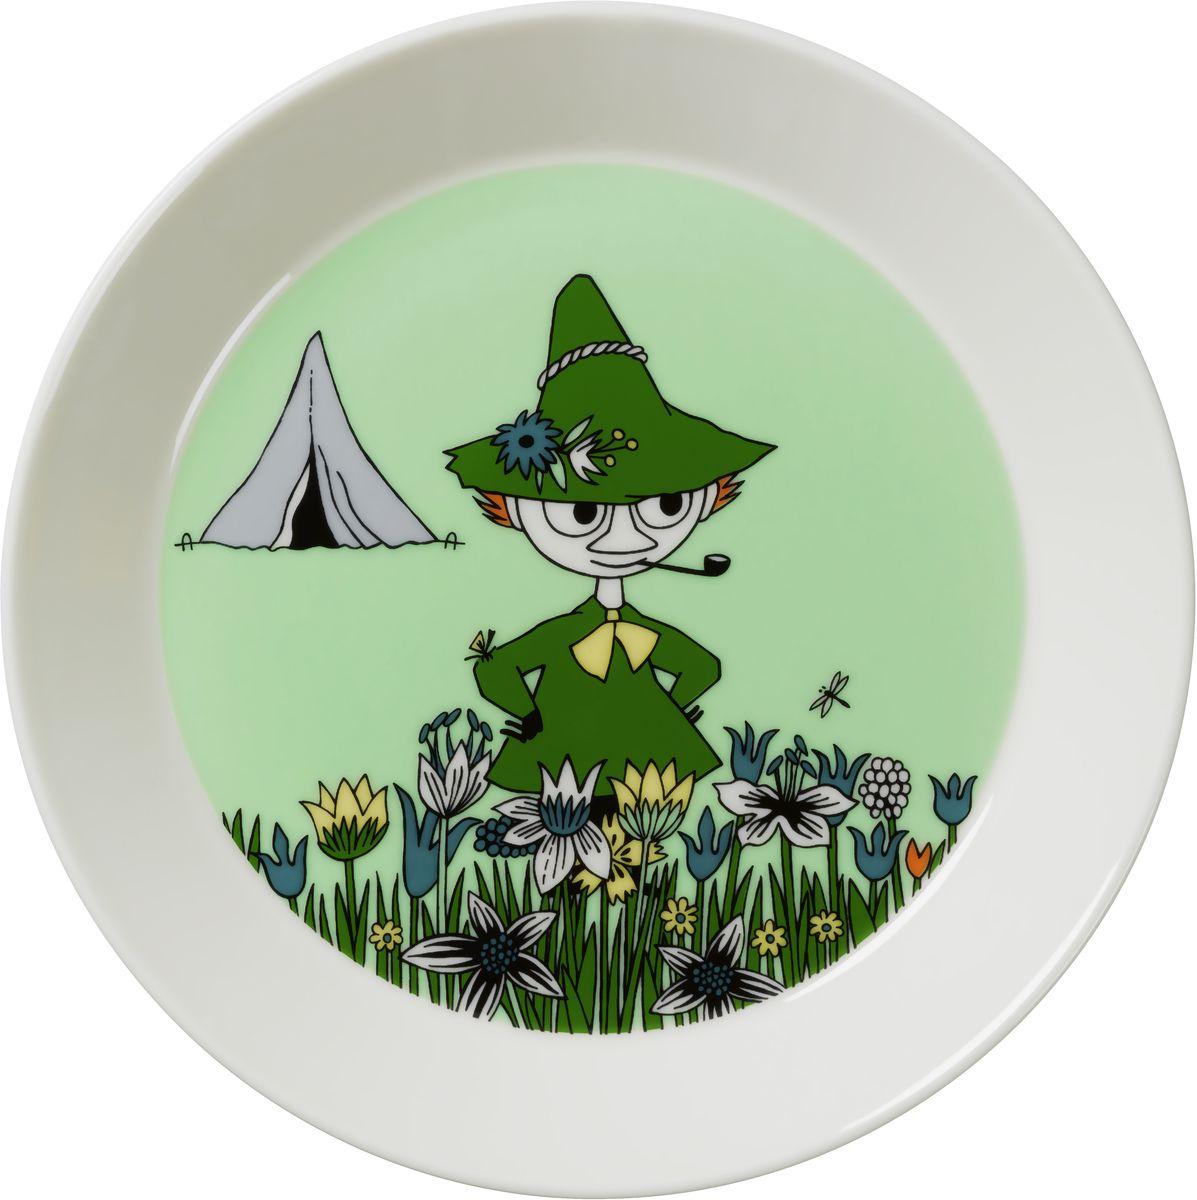 Тарелка Arabia Finland Снусмумрик, цвет: зеленый, диаметр 19 см1015566